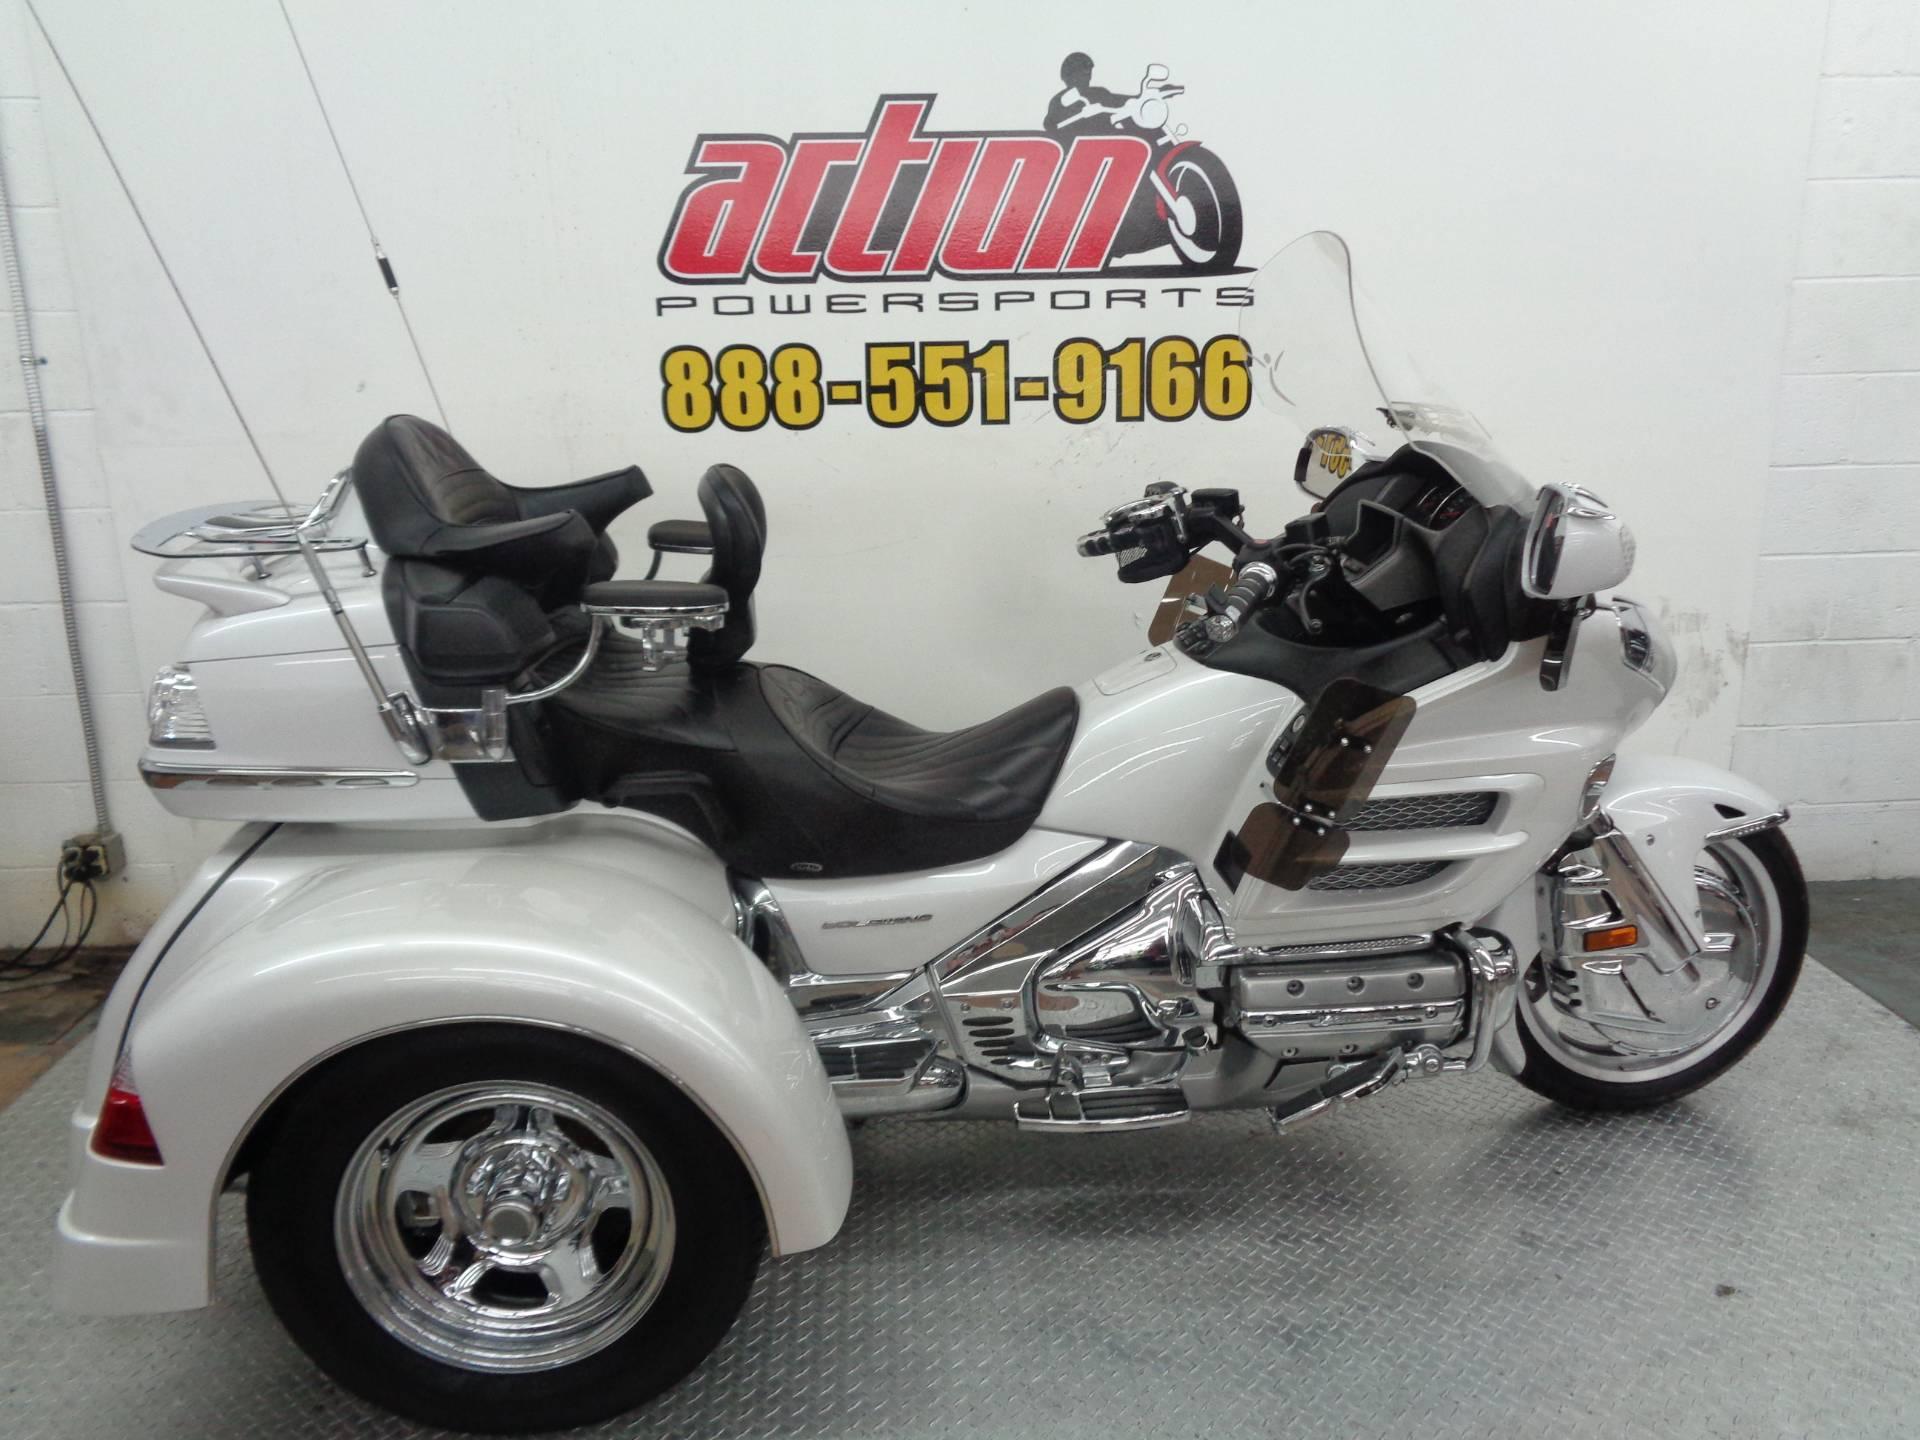 2008 Honda Goldwing Trike In Tulsa, Oklahoma